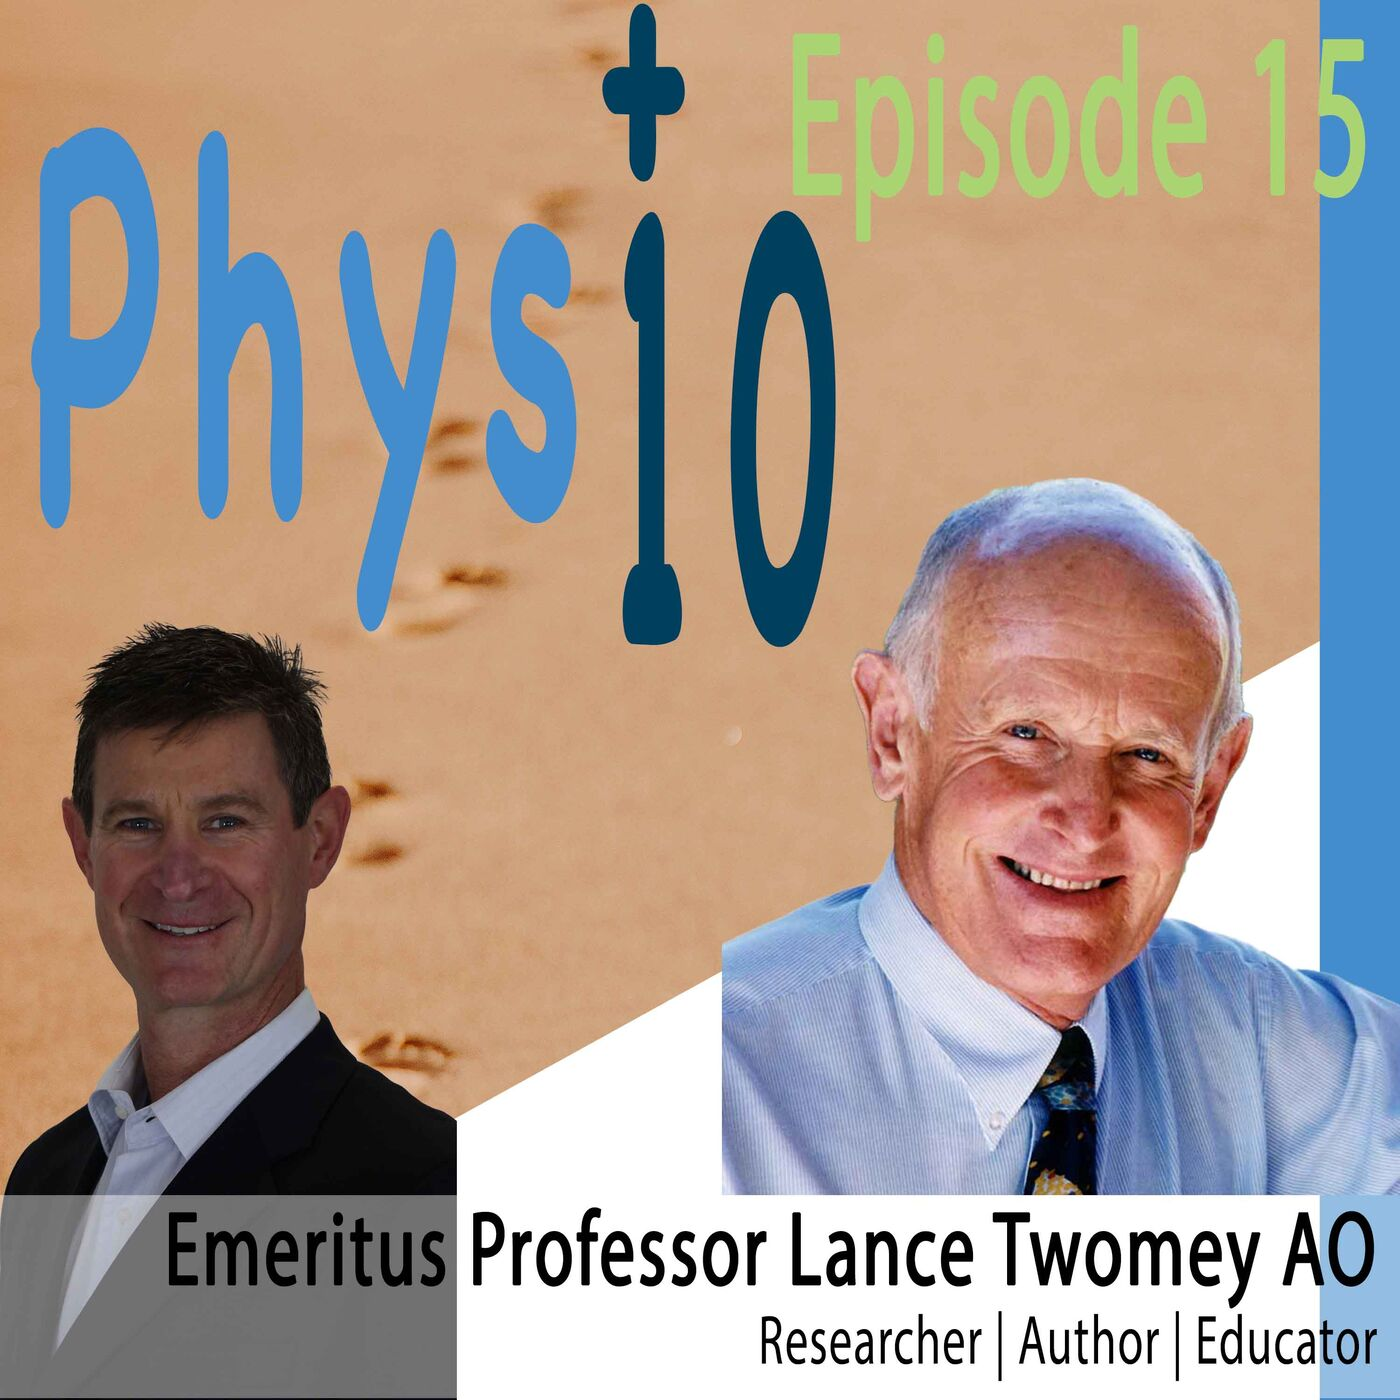 Emeritus Professor Lance Twomey AO Researcher | Educator (Part 1)